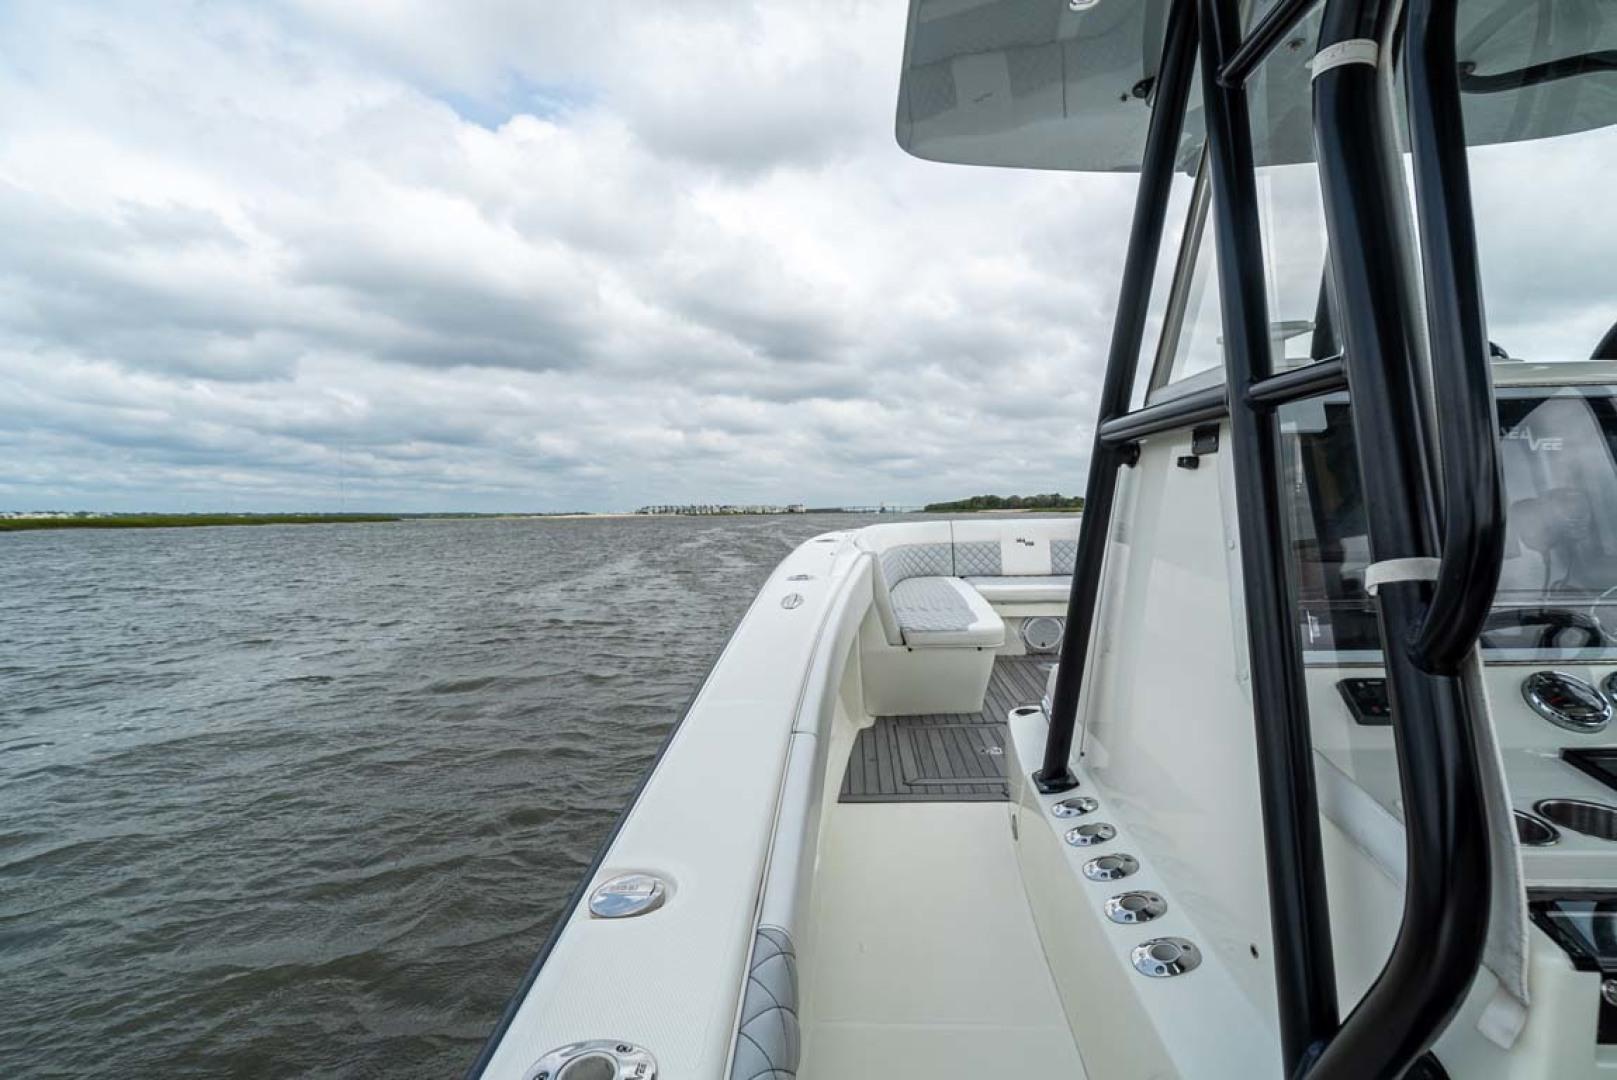 SeaVee-340 B Center Console 2014-Riff Raff Mount Pleasant-South Carolina-United States Port Deck-1509719 | Thumbnail